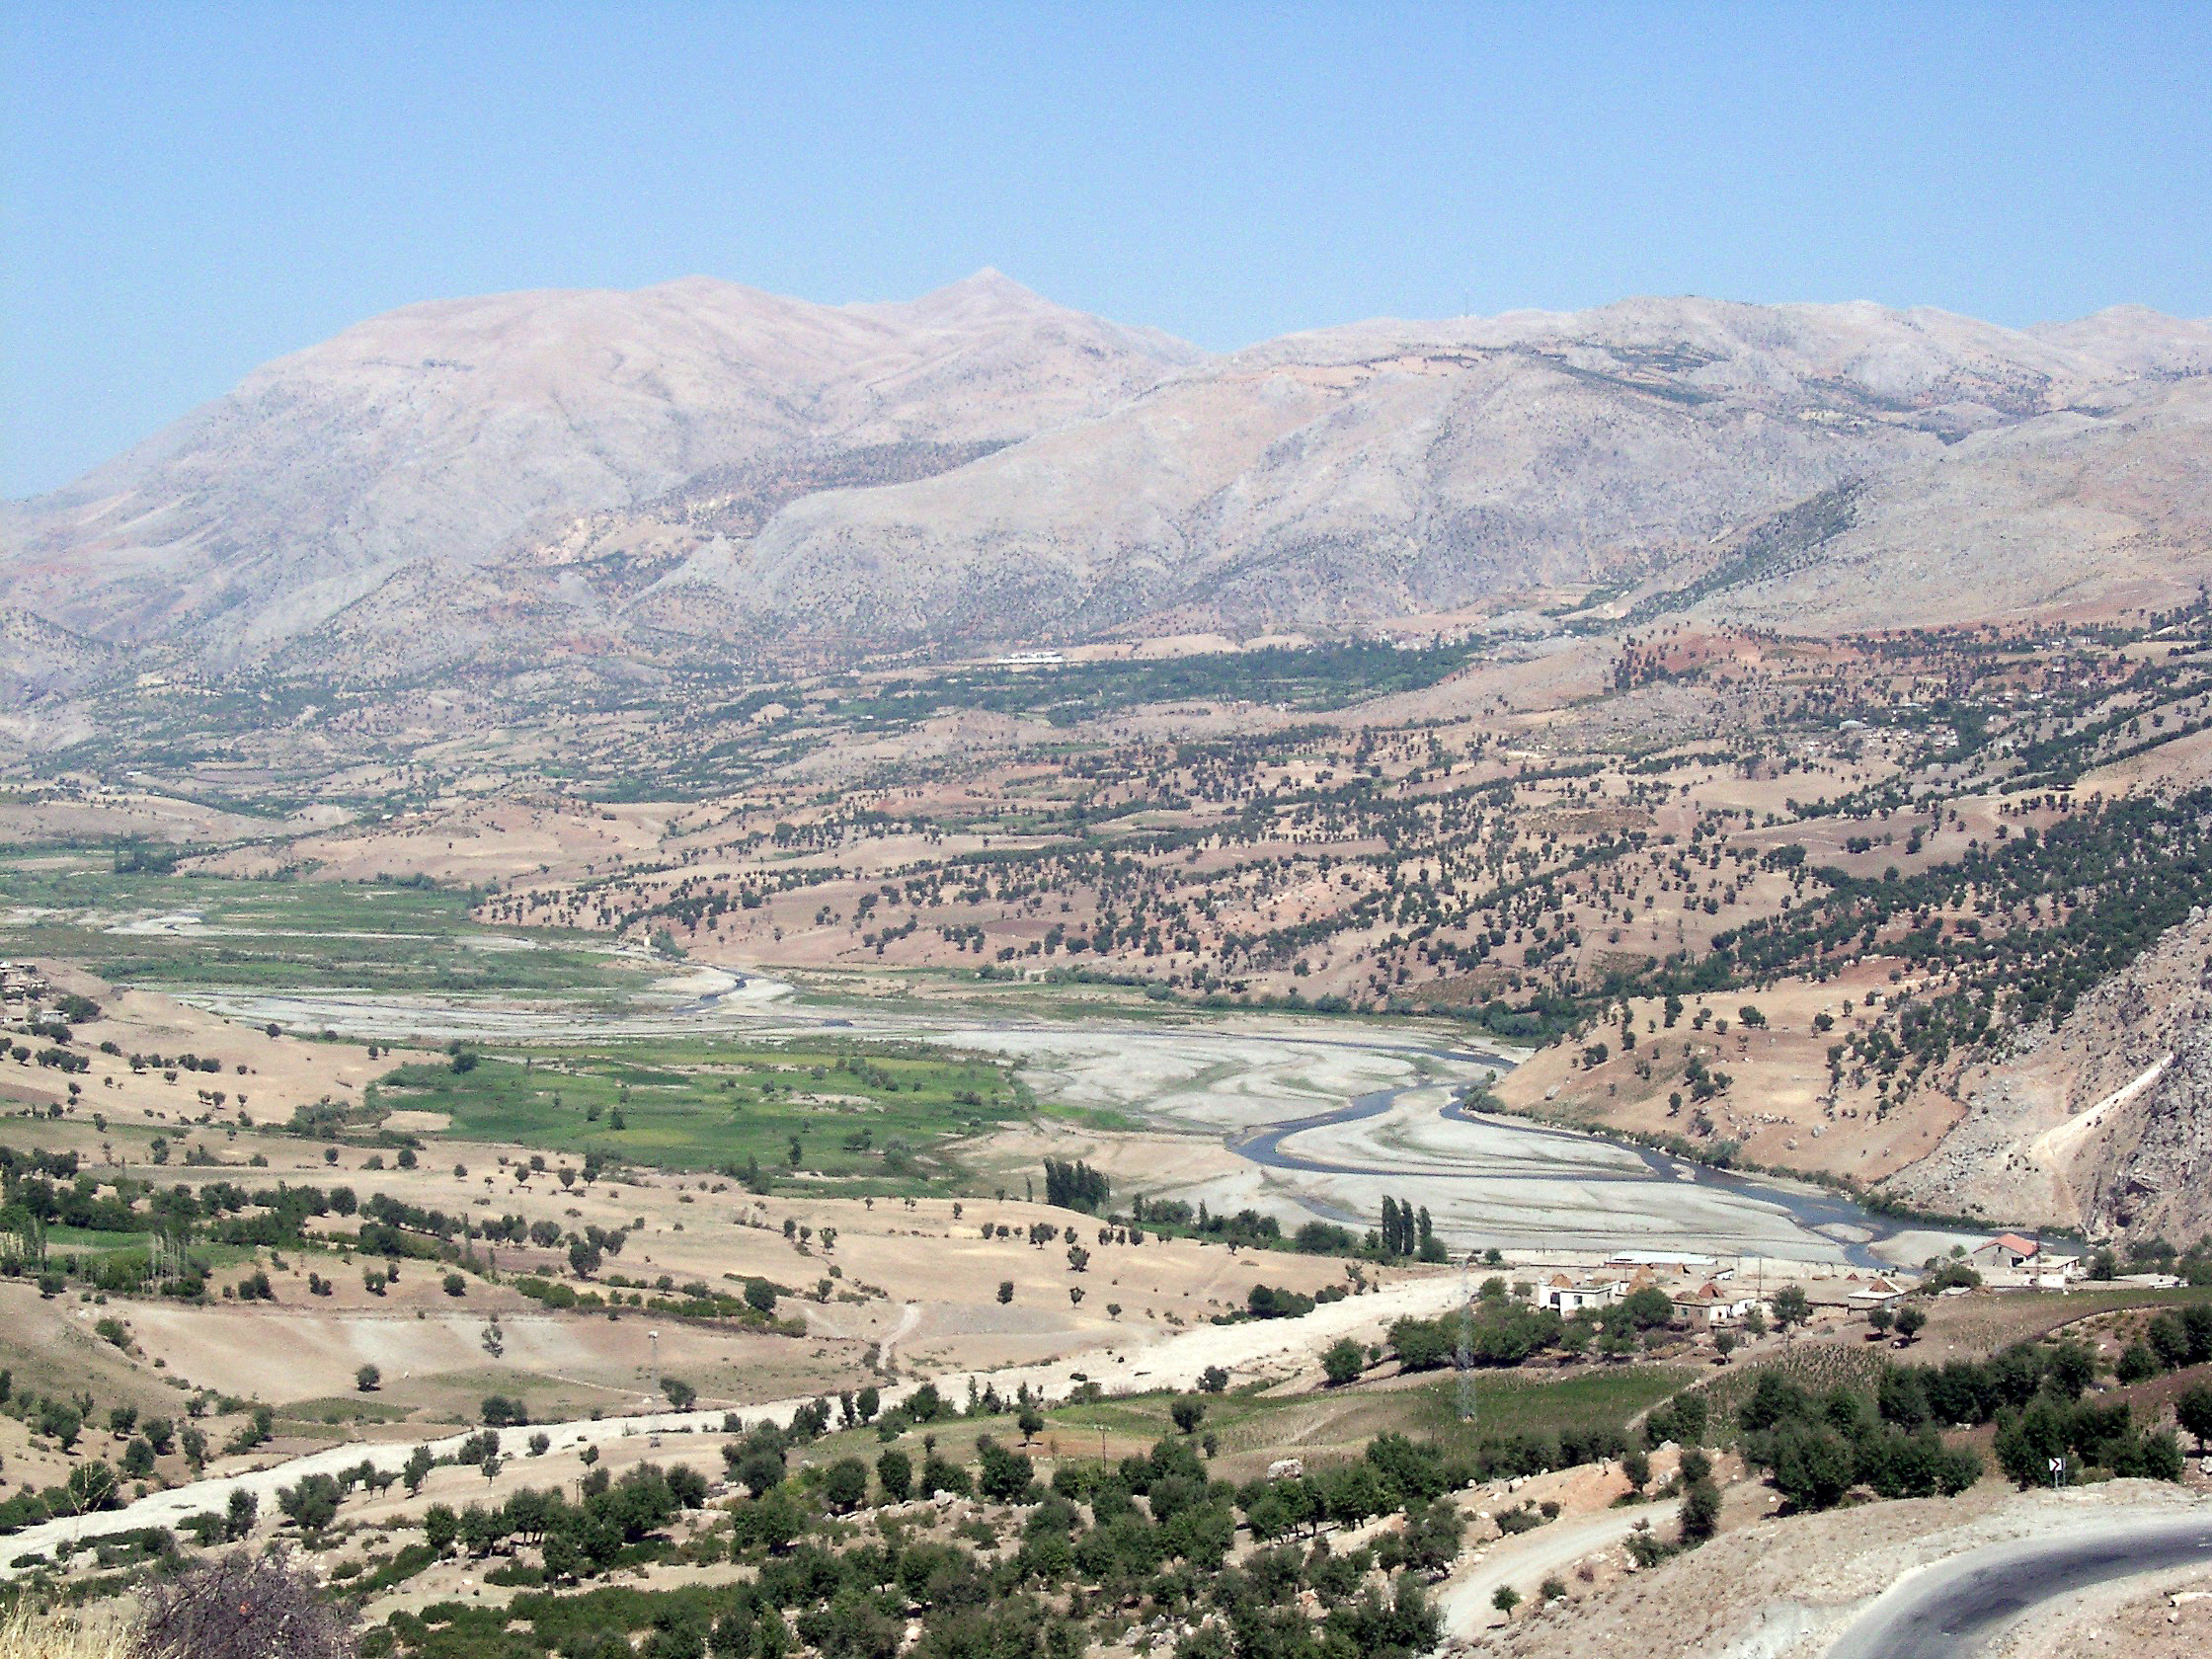 http://upload.wikimedia.org/wikipedia/commons/3/3e/View_to_Mount_Nemrut.jpg